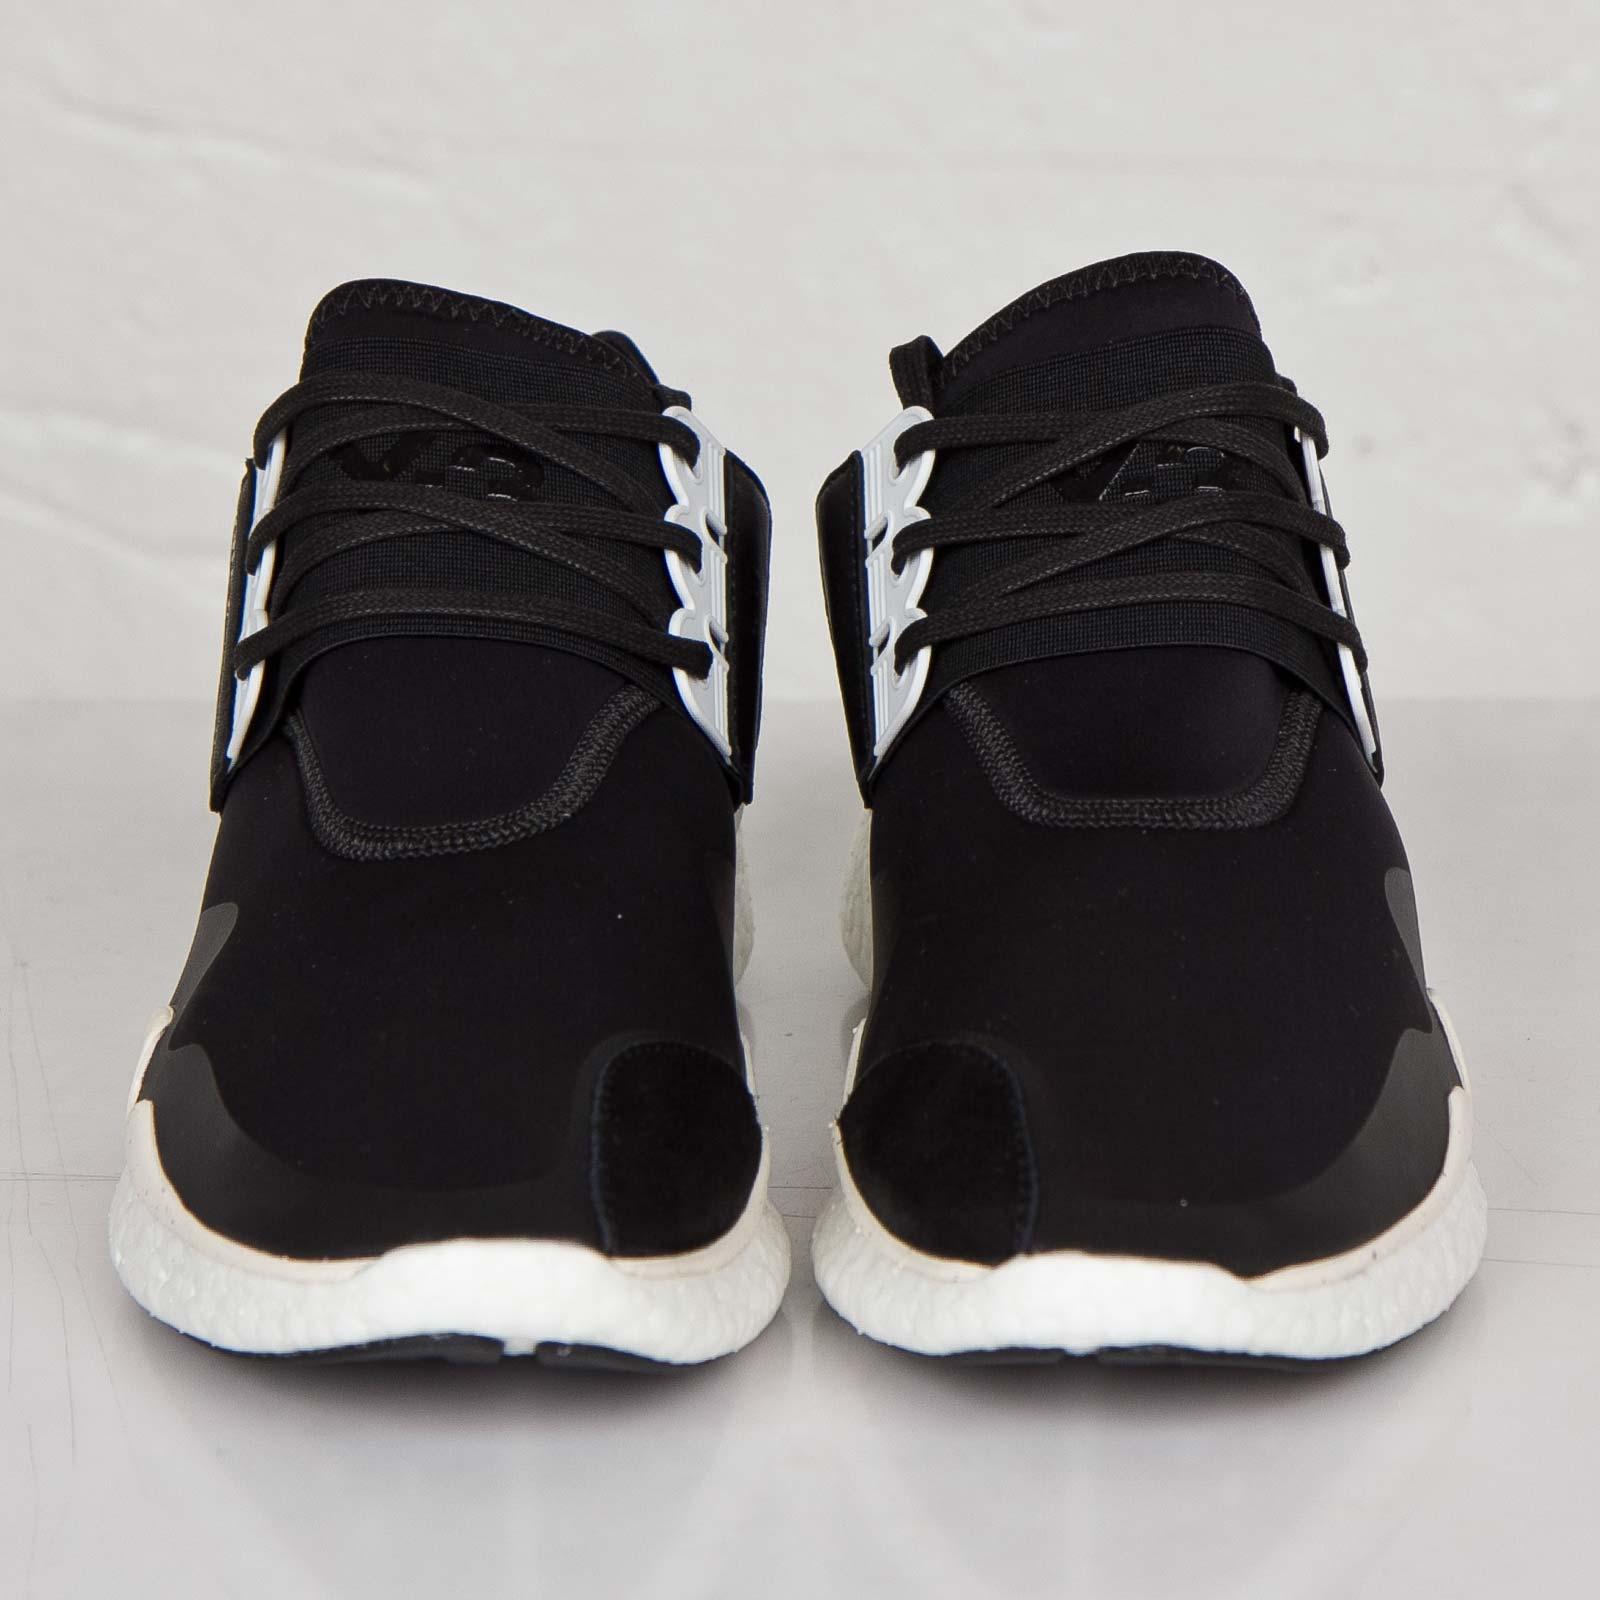 huge selection of 347f1 27b86 adidas Y-3 Retro Boost - B35693 - Sneakersnstuff   sneakers   streetwear  online since 1999